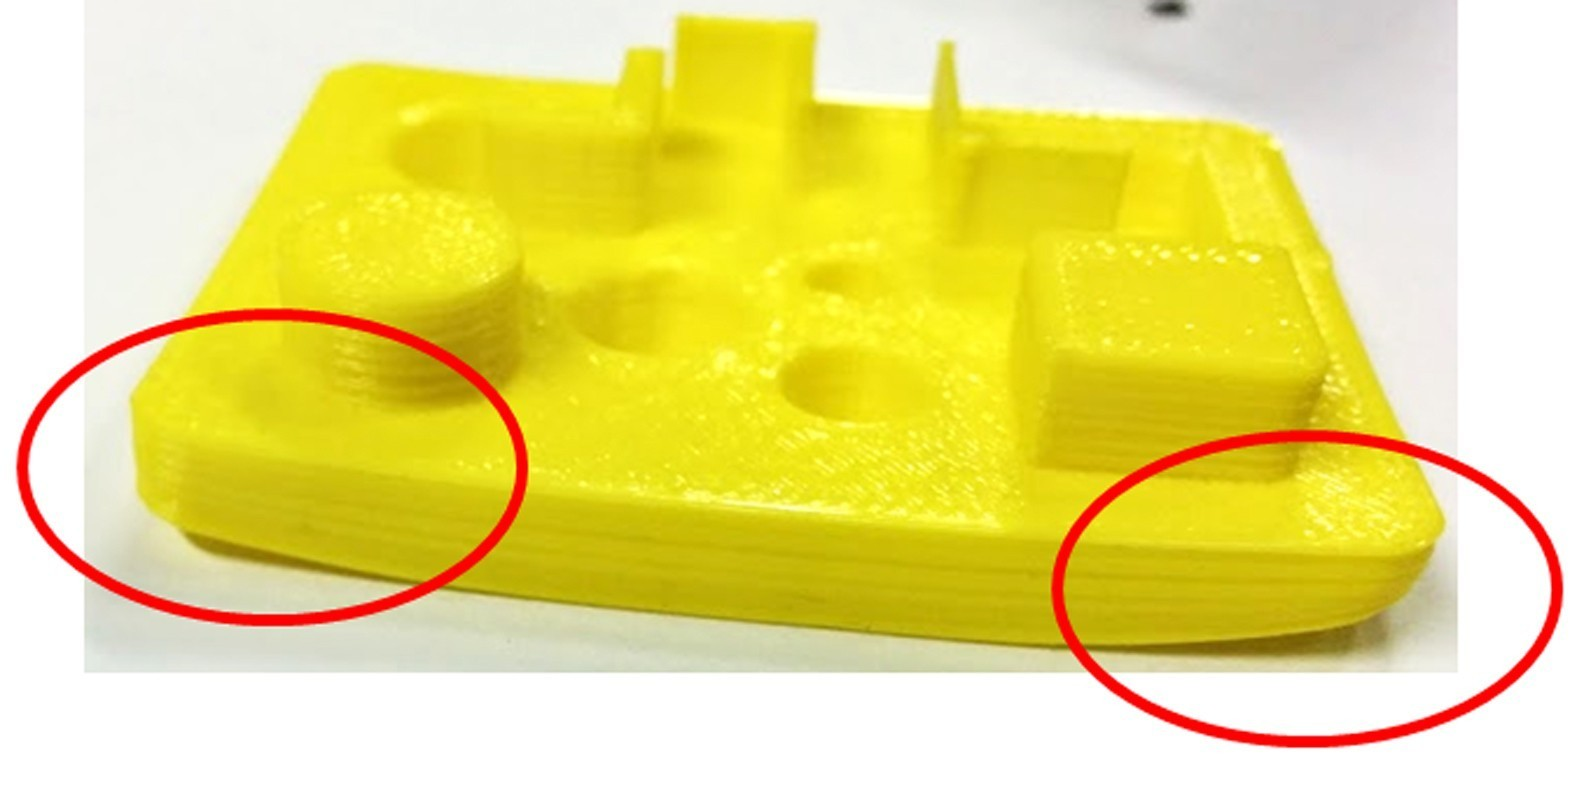 warping 3D printing